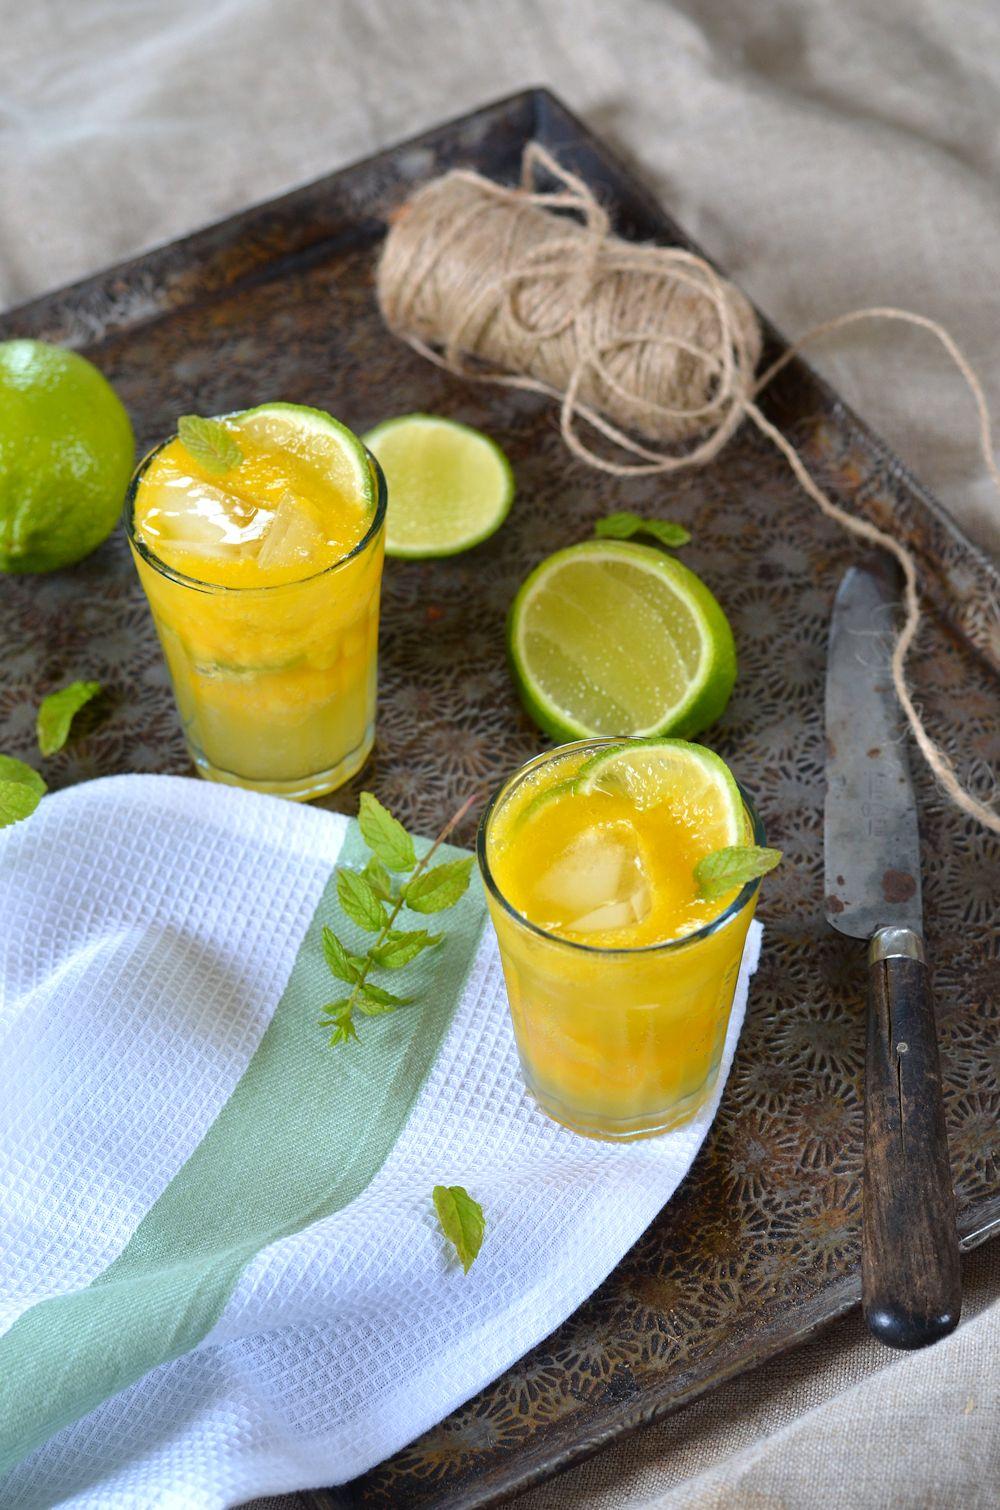 mocktail la mangue gingembre et citron vert recette tangerine zest. Black Bedroom Furniture Sets. Home Design Ideas